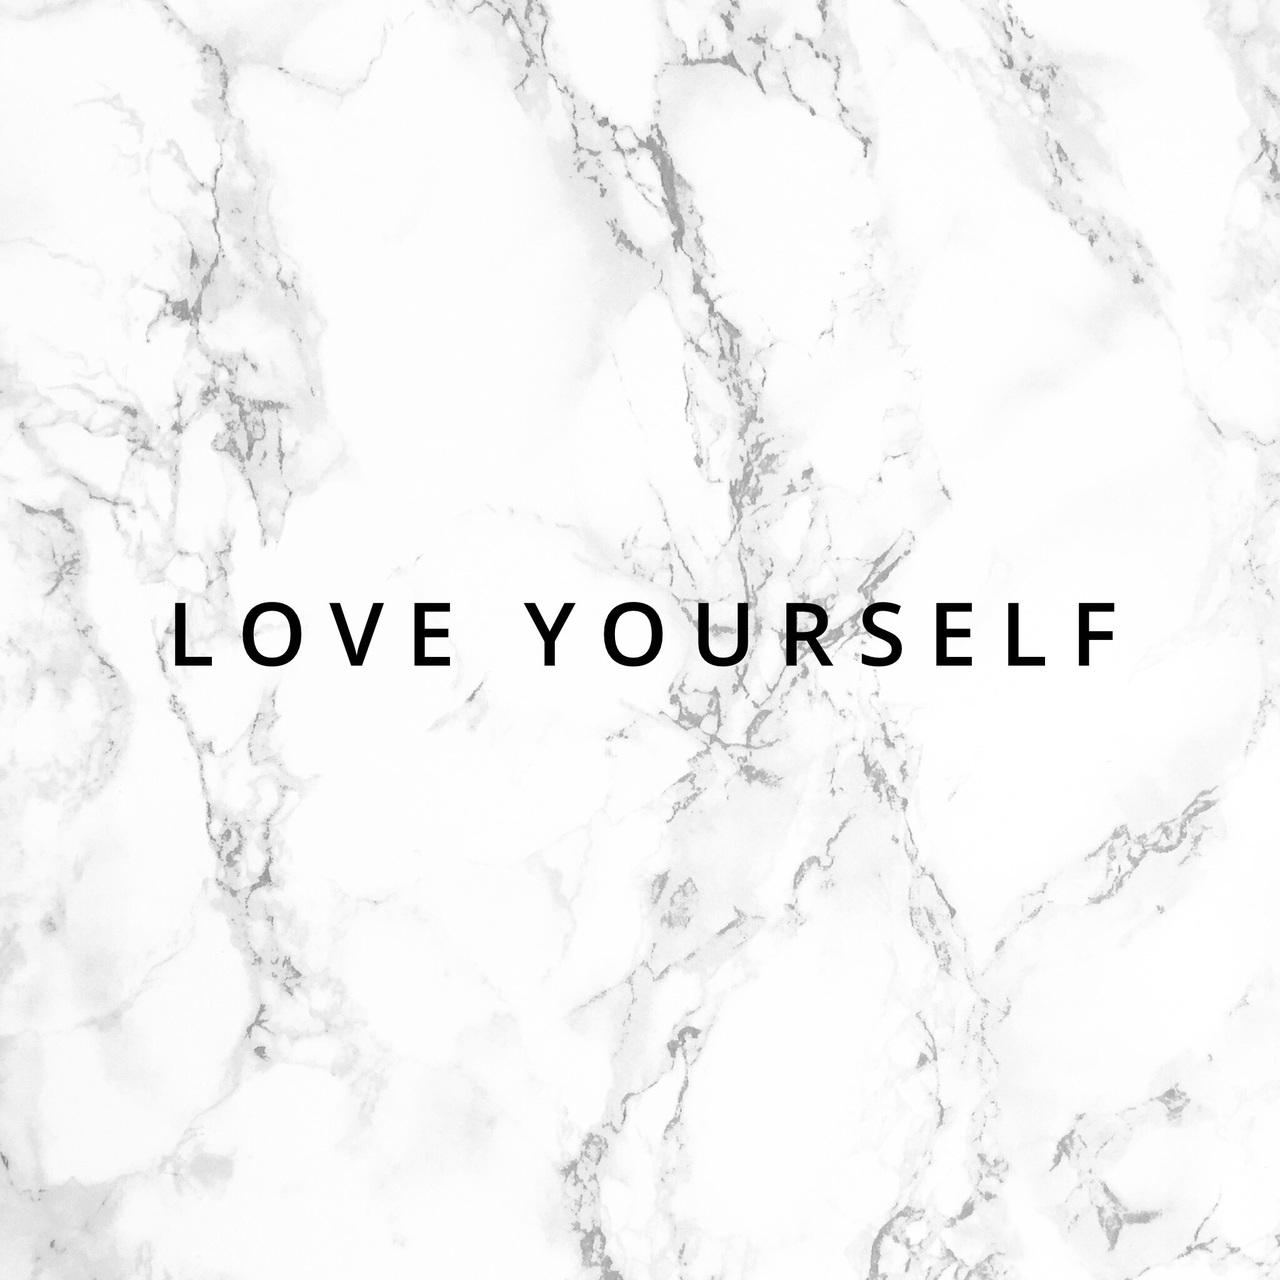 Great Wallpaper Marble Heart - original  You Should Have_41774.jpg